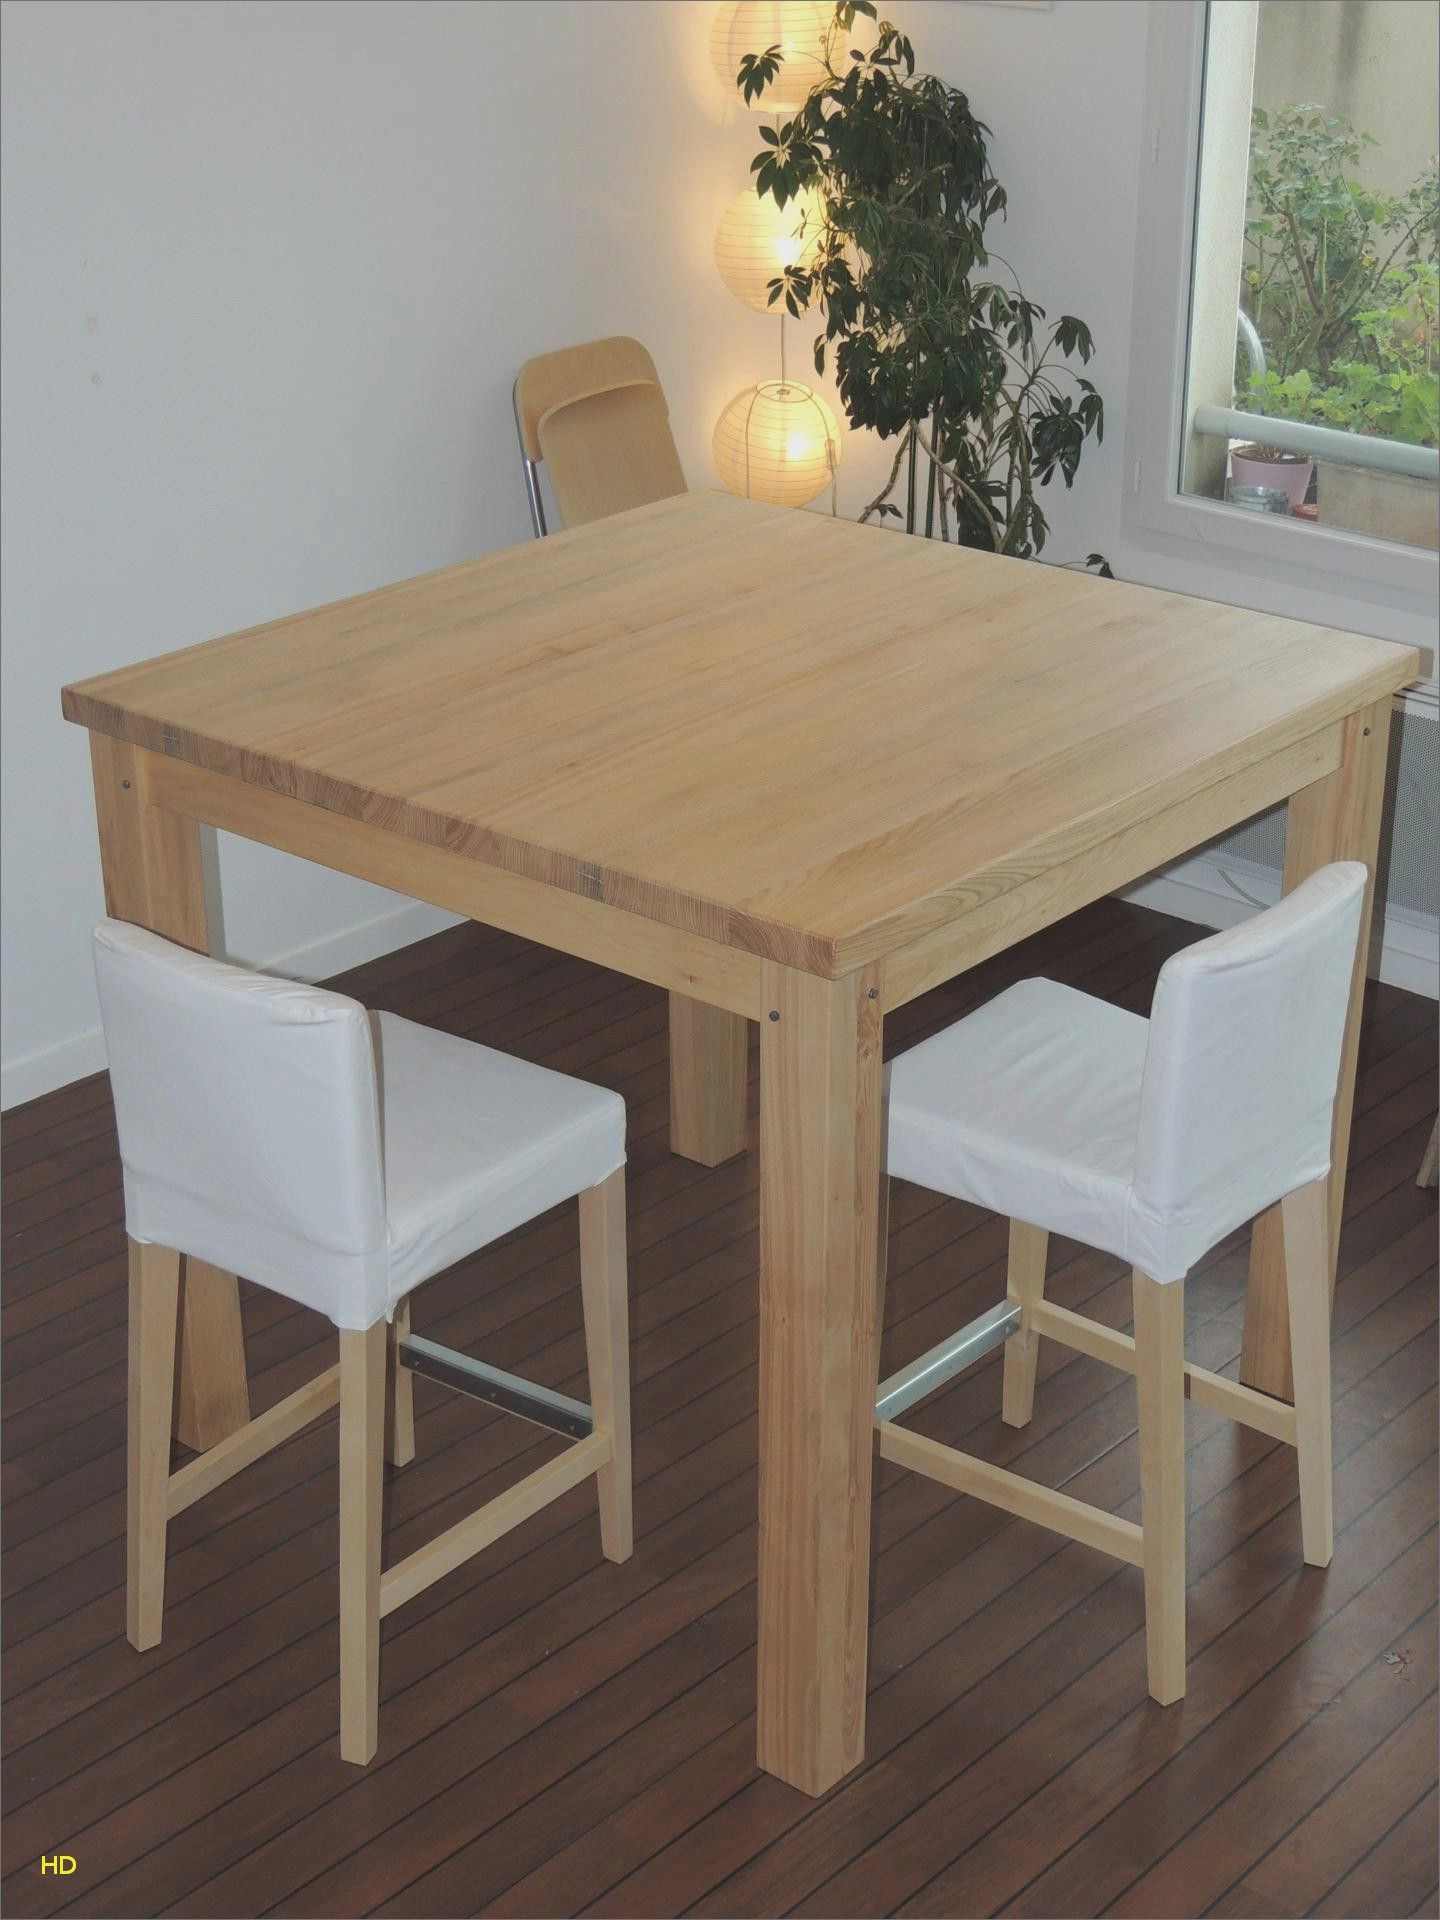 Ikea Table De Cuisine Meilleur Table Ronde Cuisine Ikea Ikea ... destiné Table Ronde Jardin Ikea